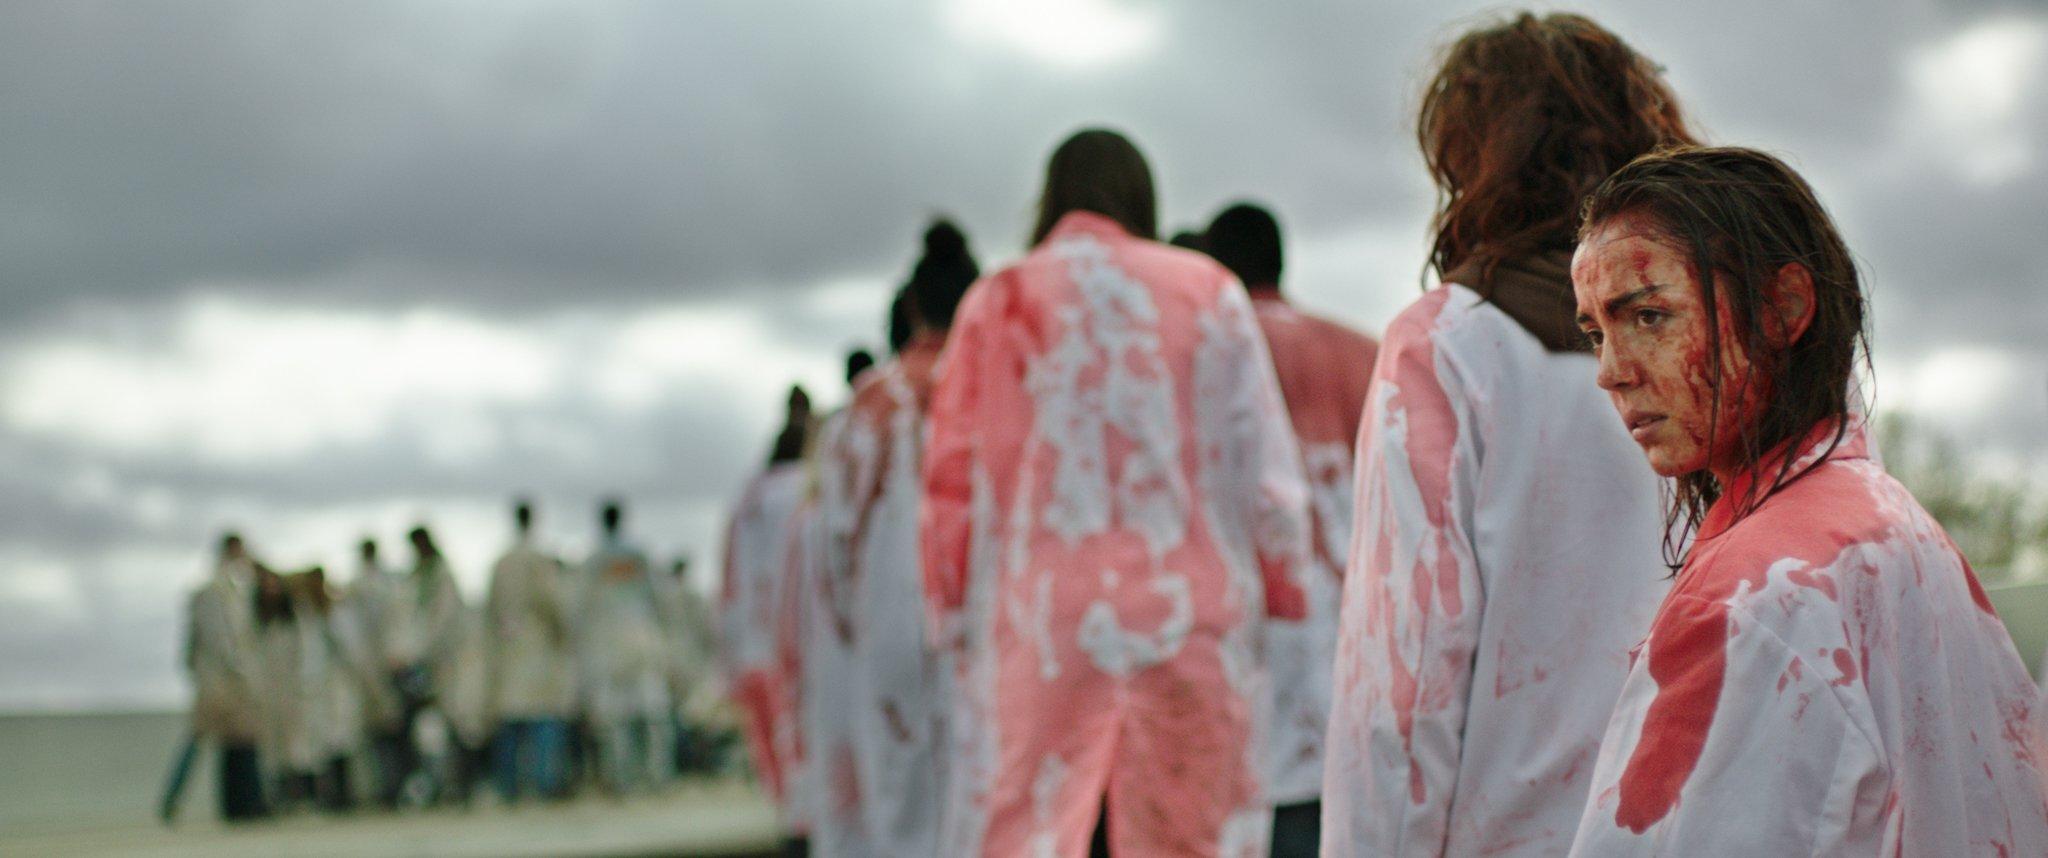 Photo du film Grave avec Garance Marillier en sang